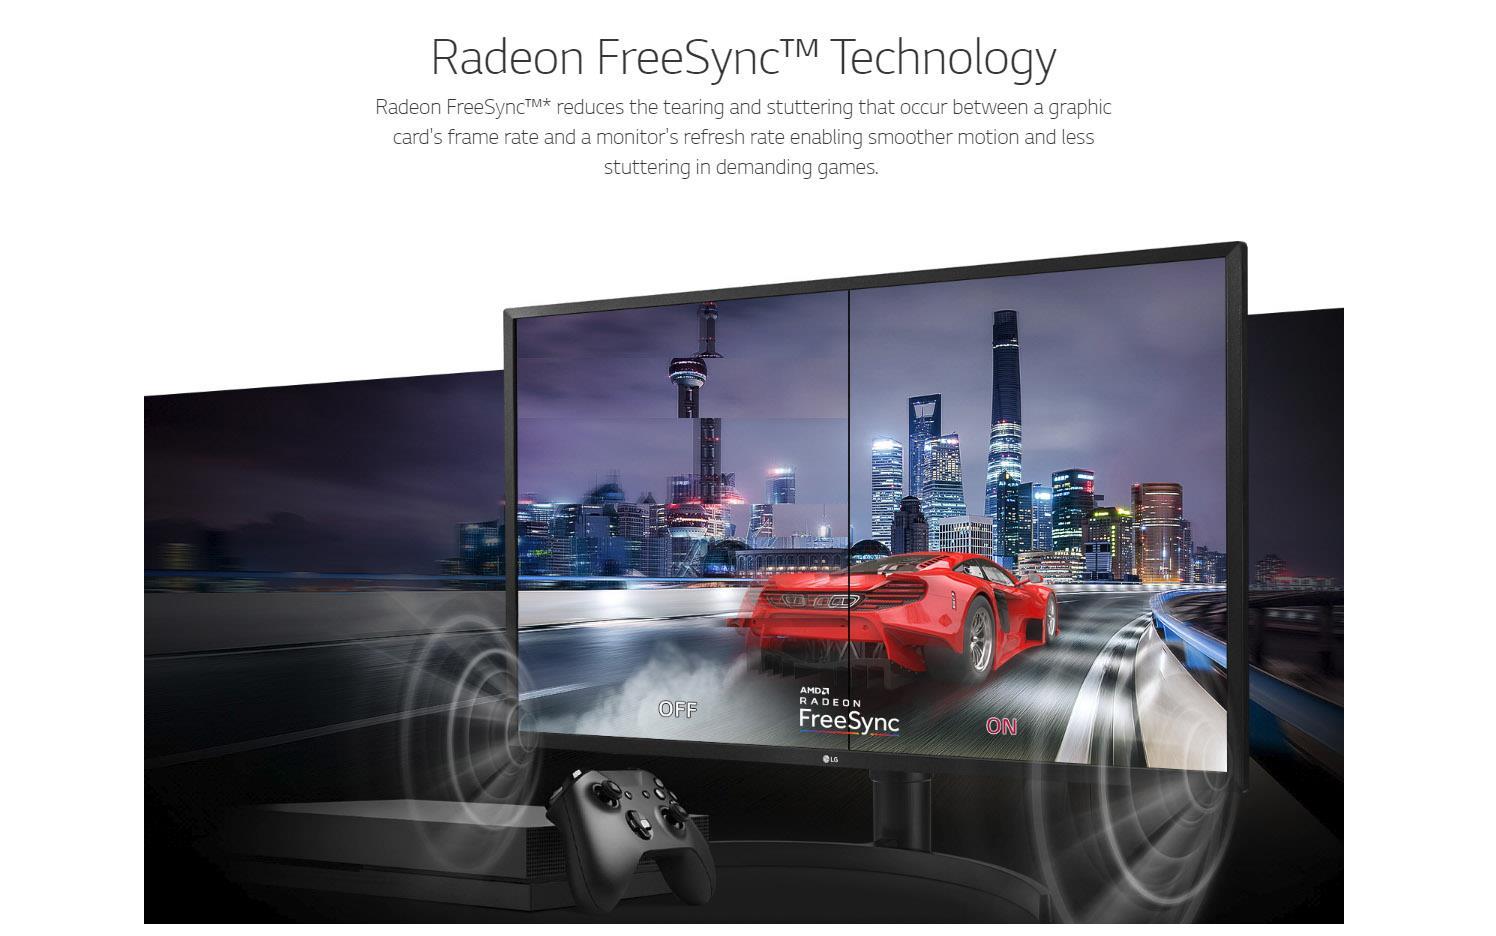 LG 32UK550-B 32' Class 4K UHD Monitor w Radeon FreeSync 3840x2160 60Hz